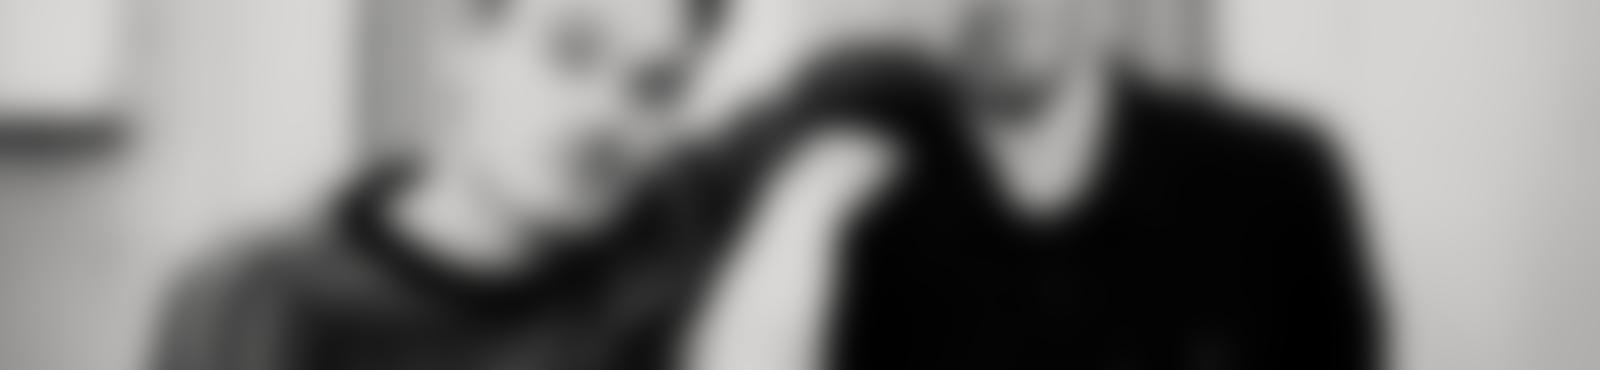 Blurred c9d1eb5f a00c 41b0 9d1b 26e3a6caf311